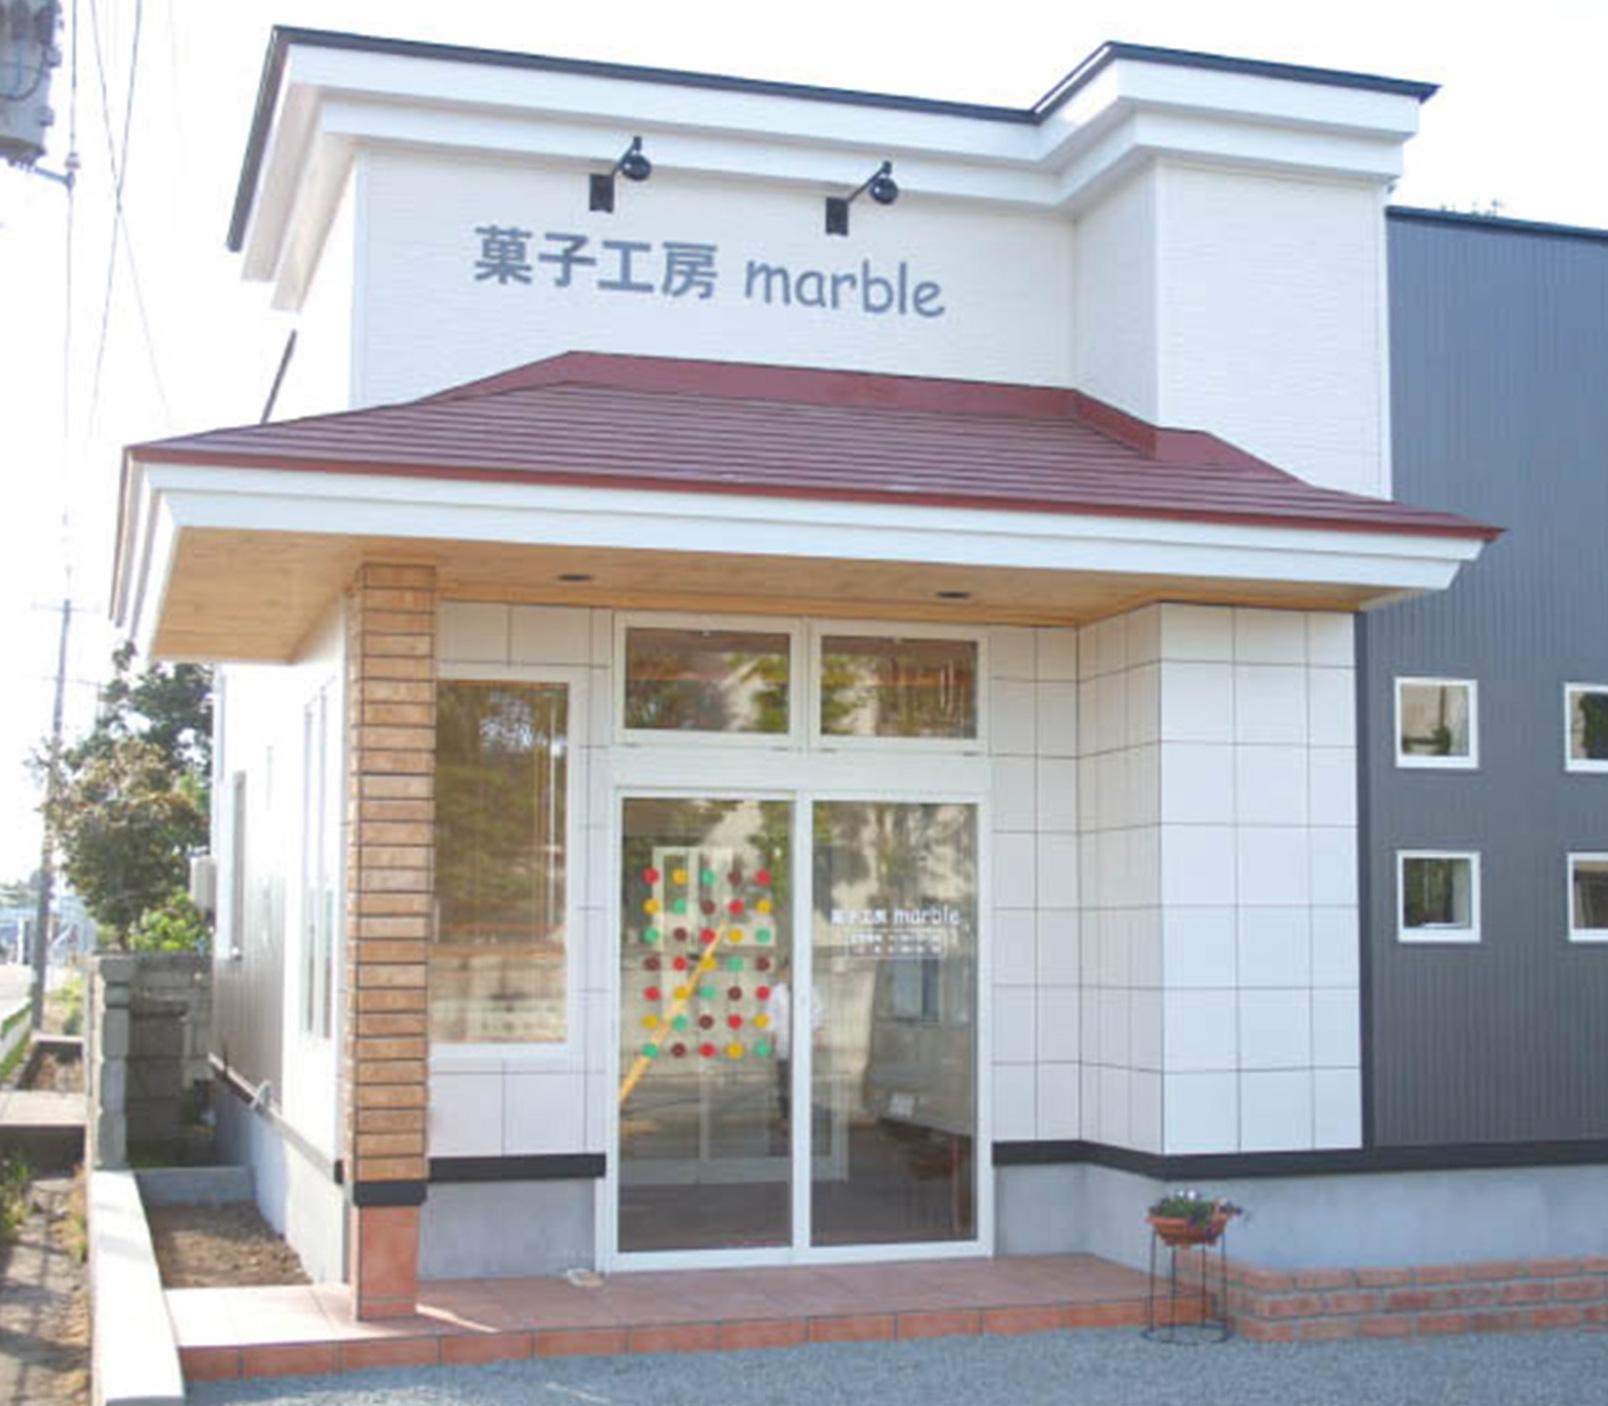 菓子工房marble 外観